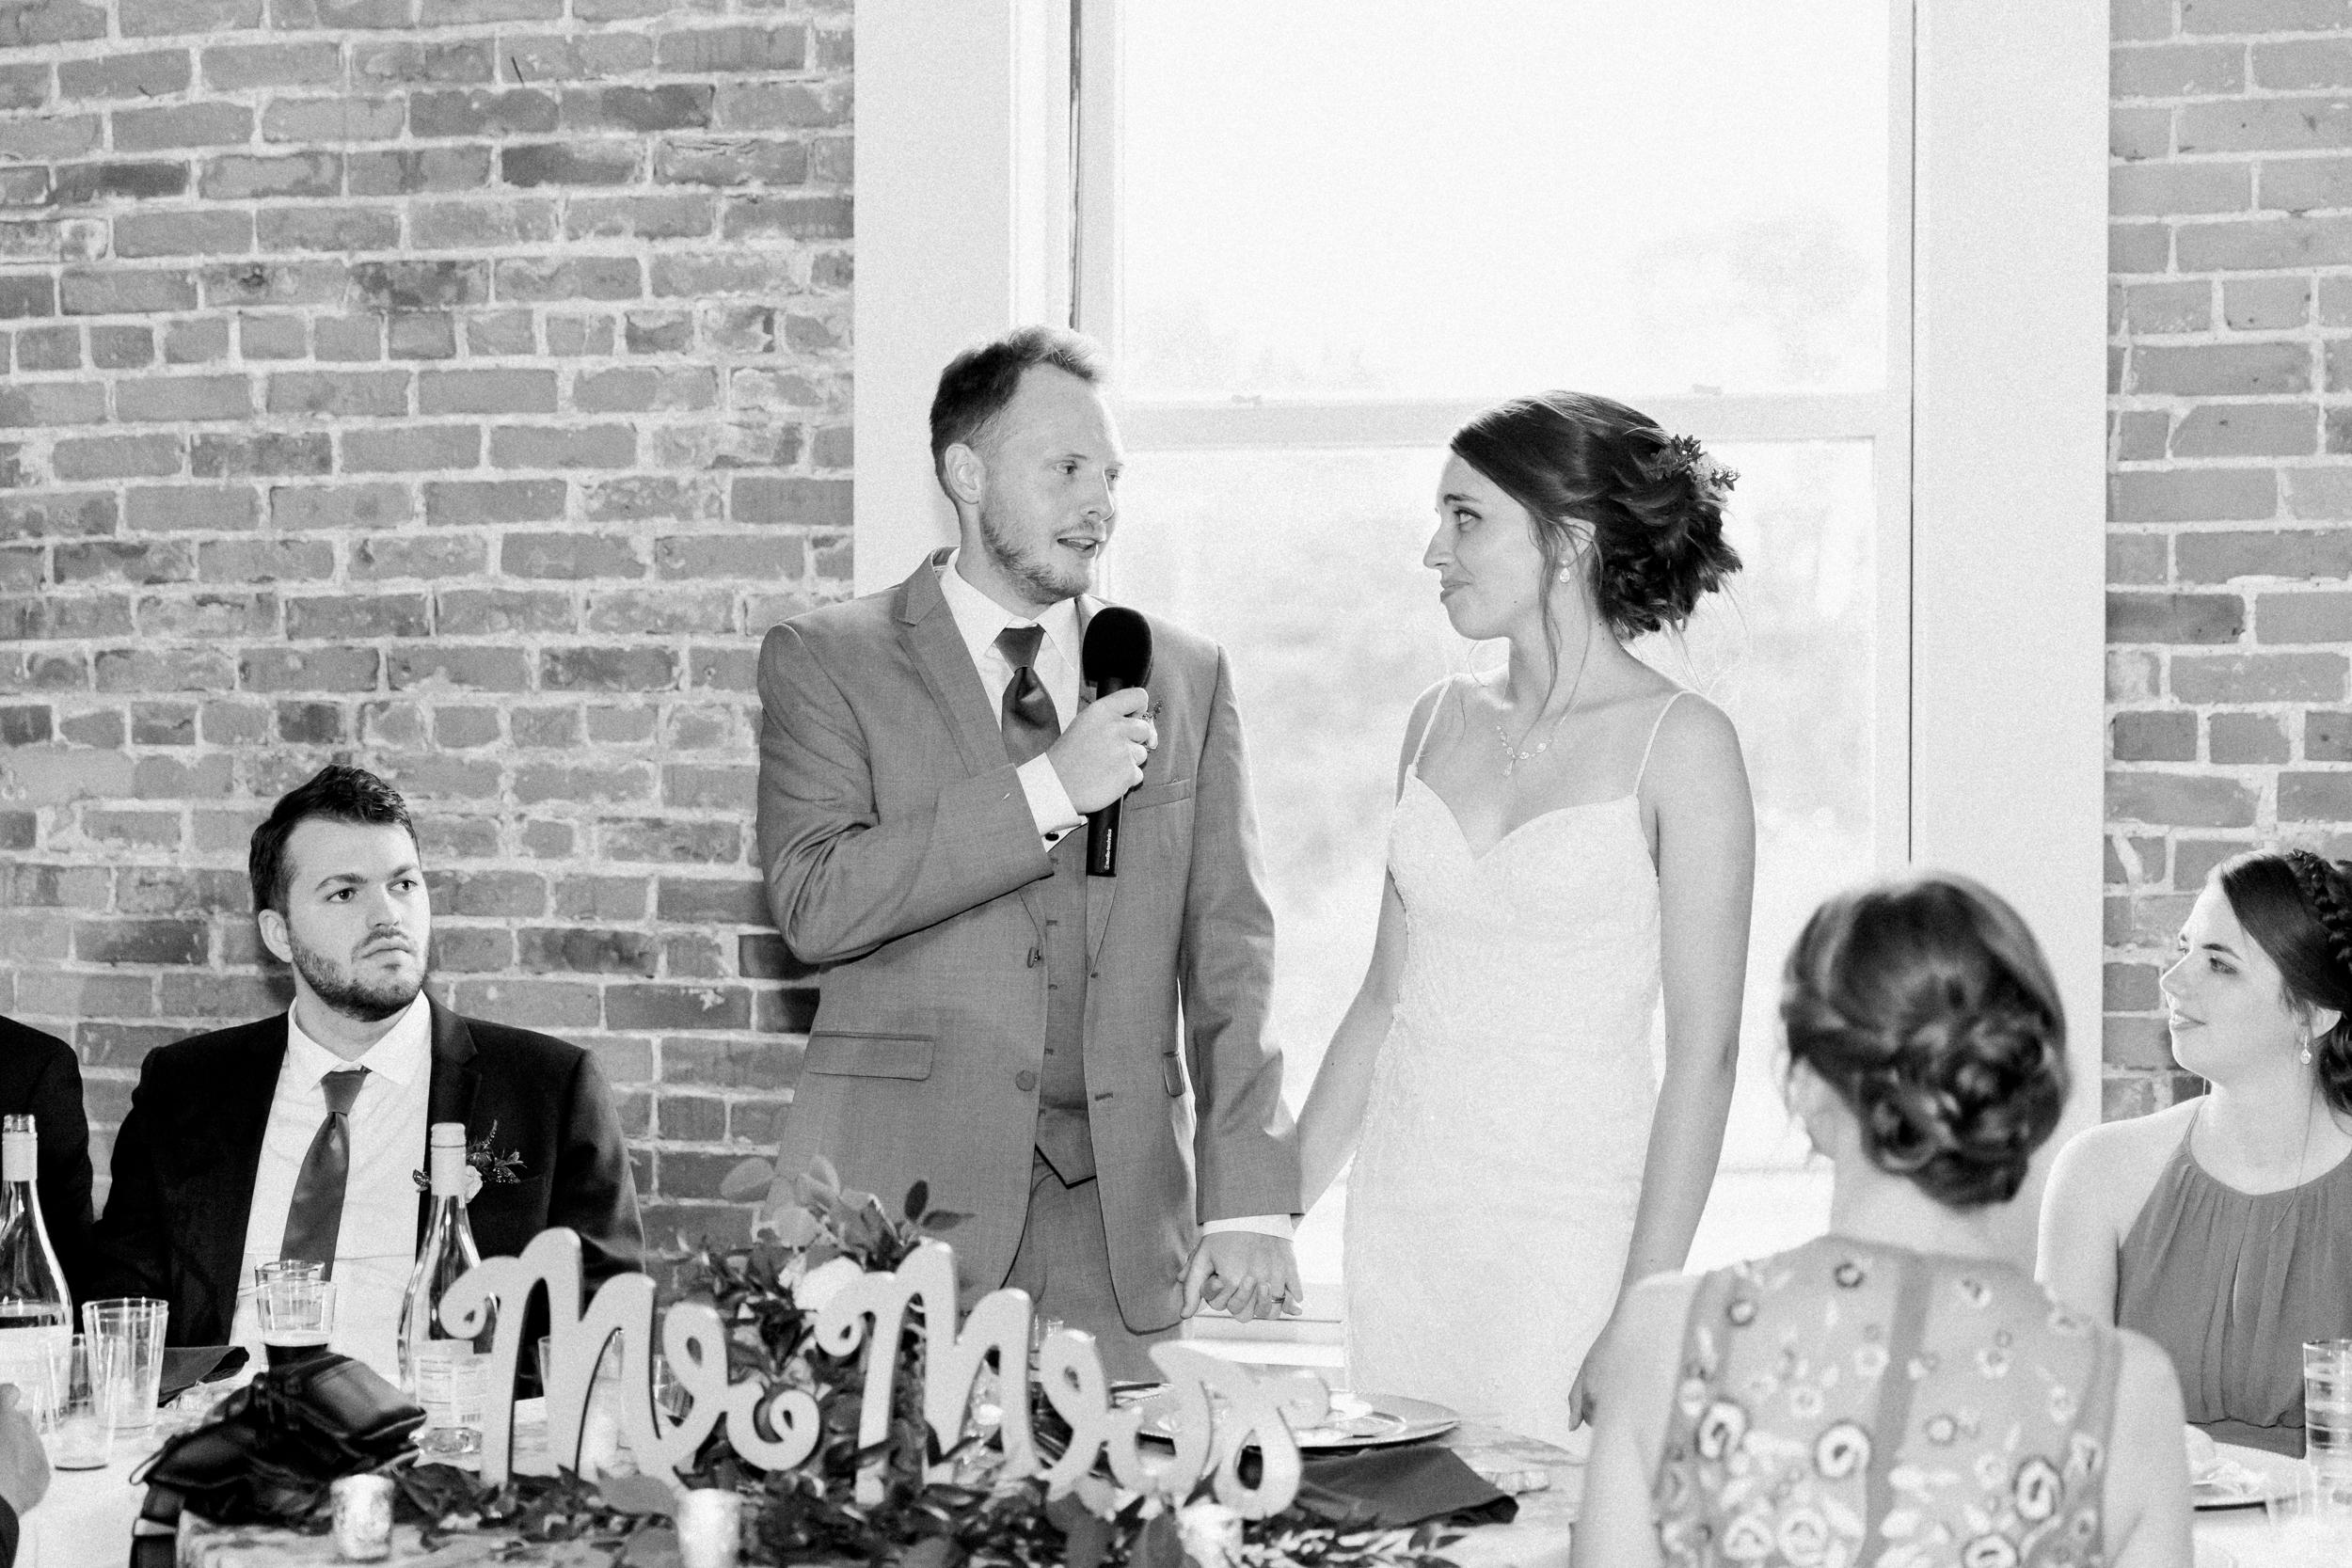 calebclairewedding-78.jpg